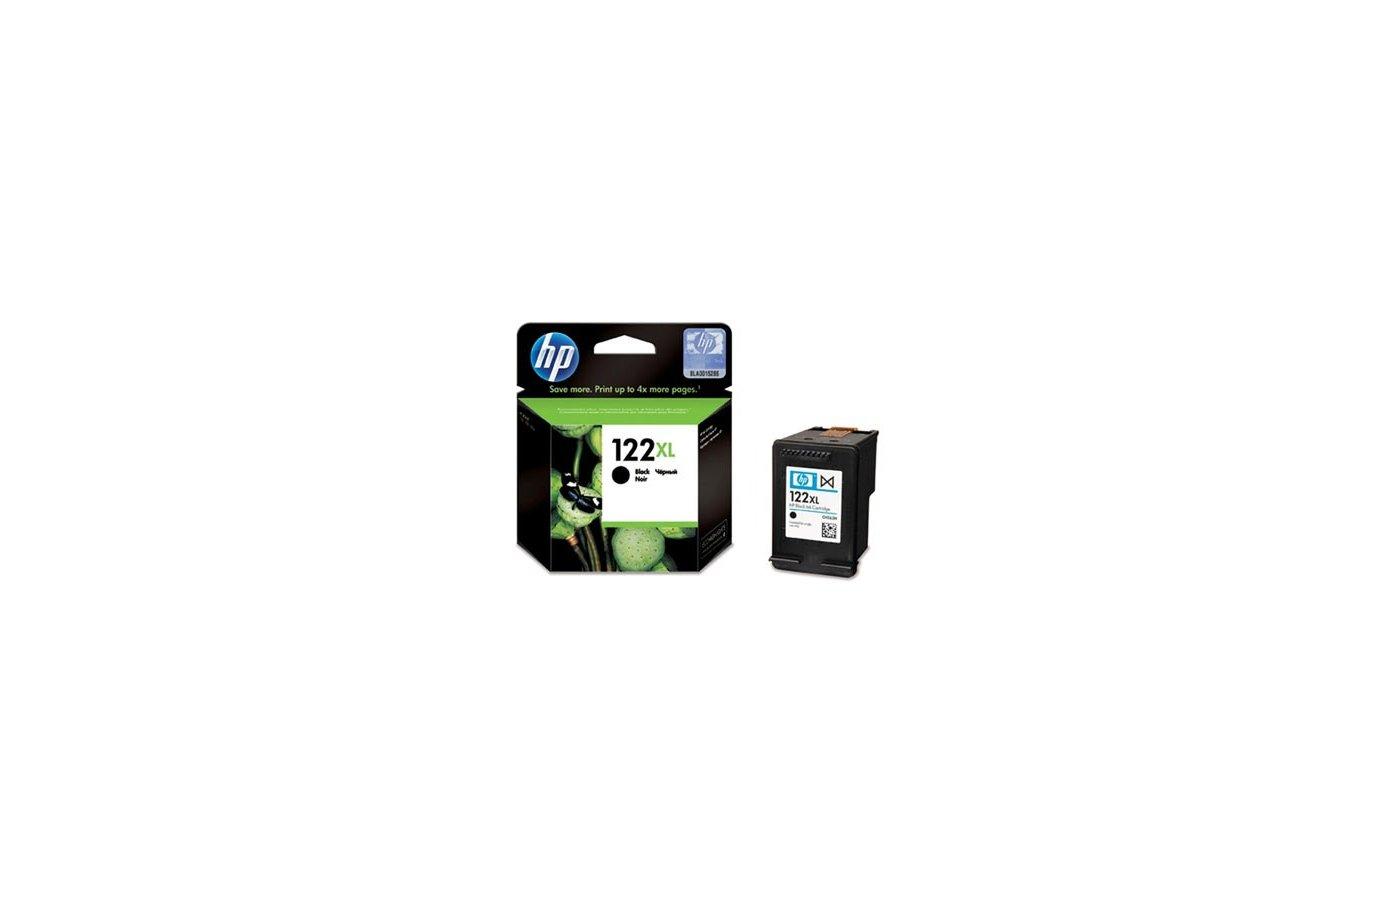 Картридж струйный HP CH563HE 122XL Black для Картридж HP DJ 1050 / 2050 / 2050s (повышенной ёмкости)